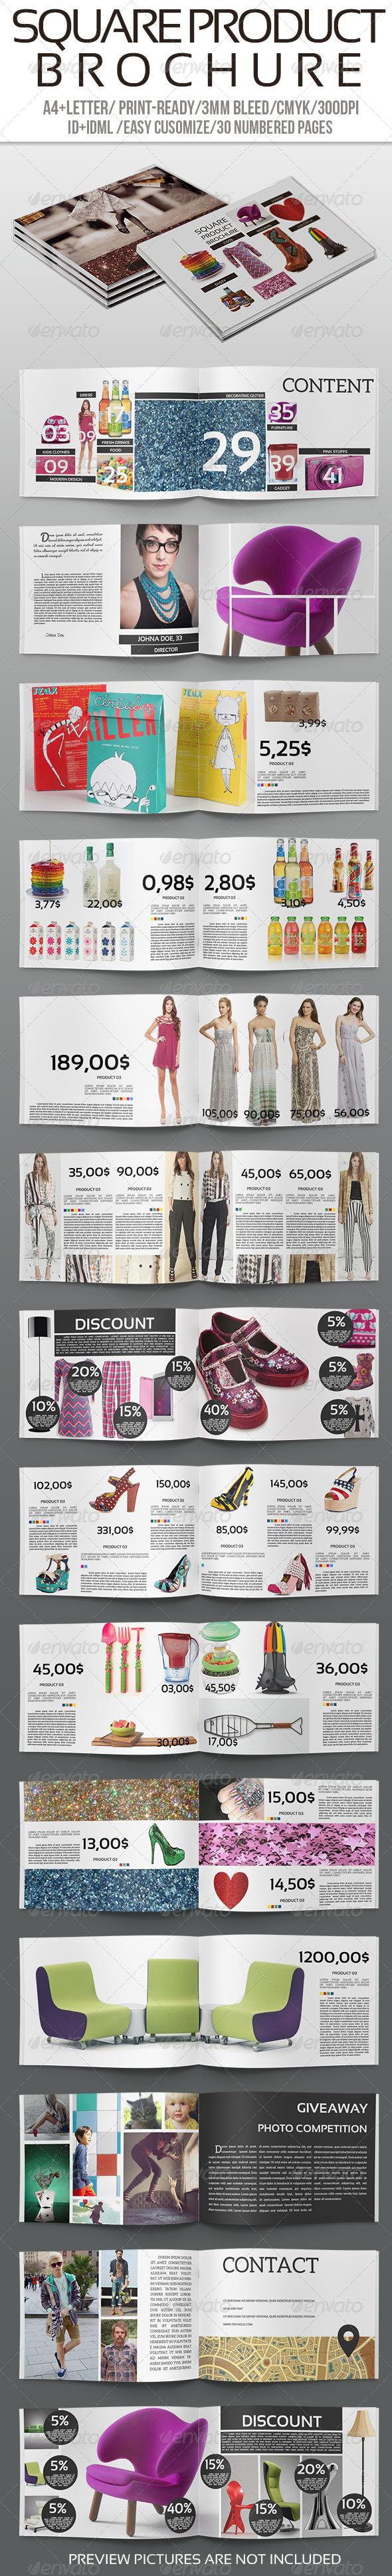 GraphicRiver Square Product Brochure 6378167